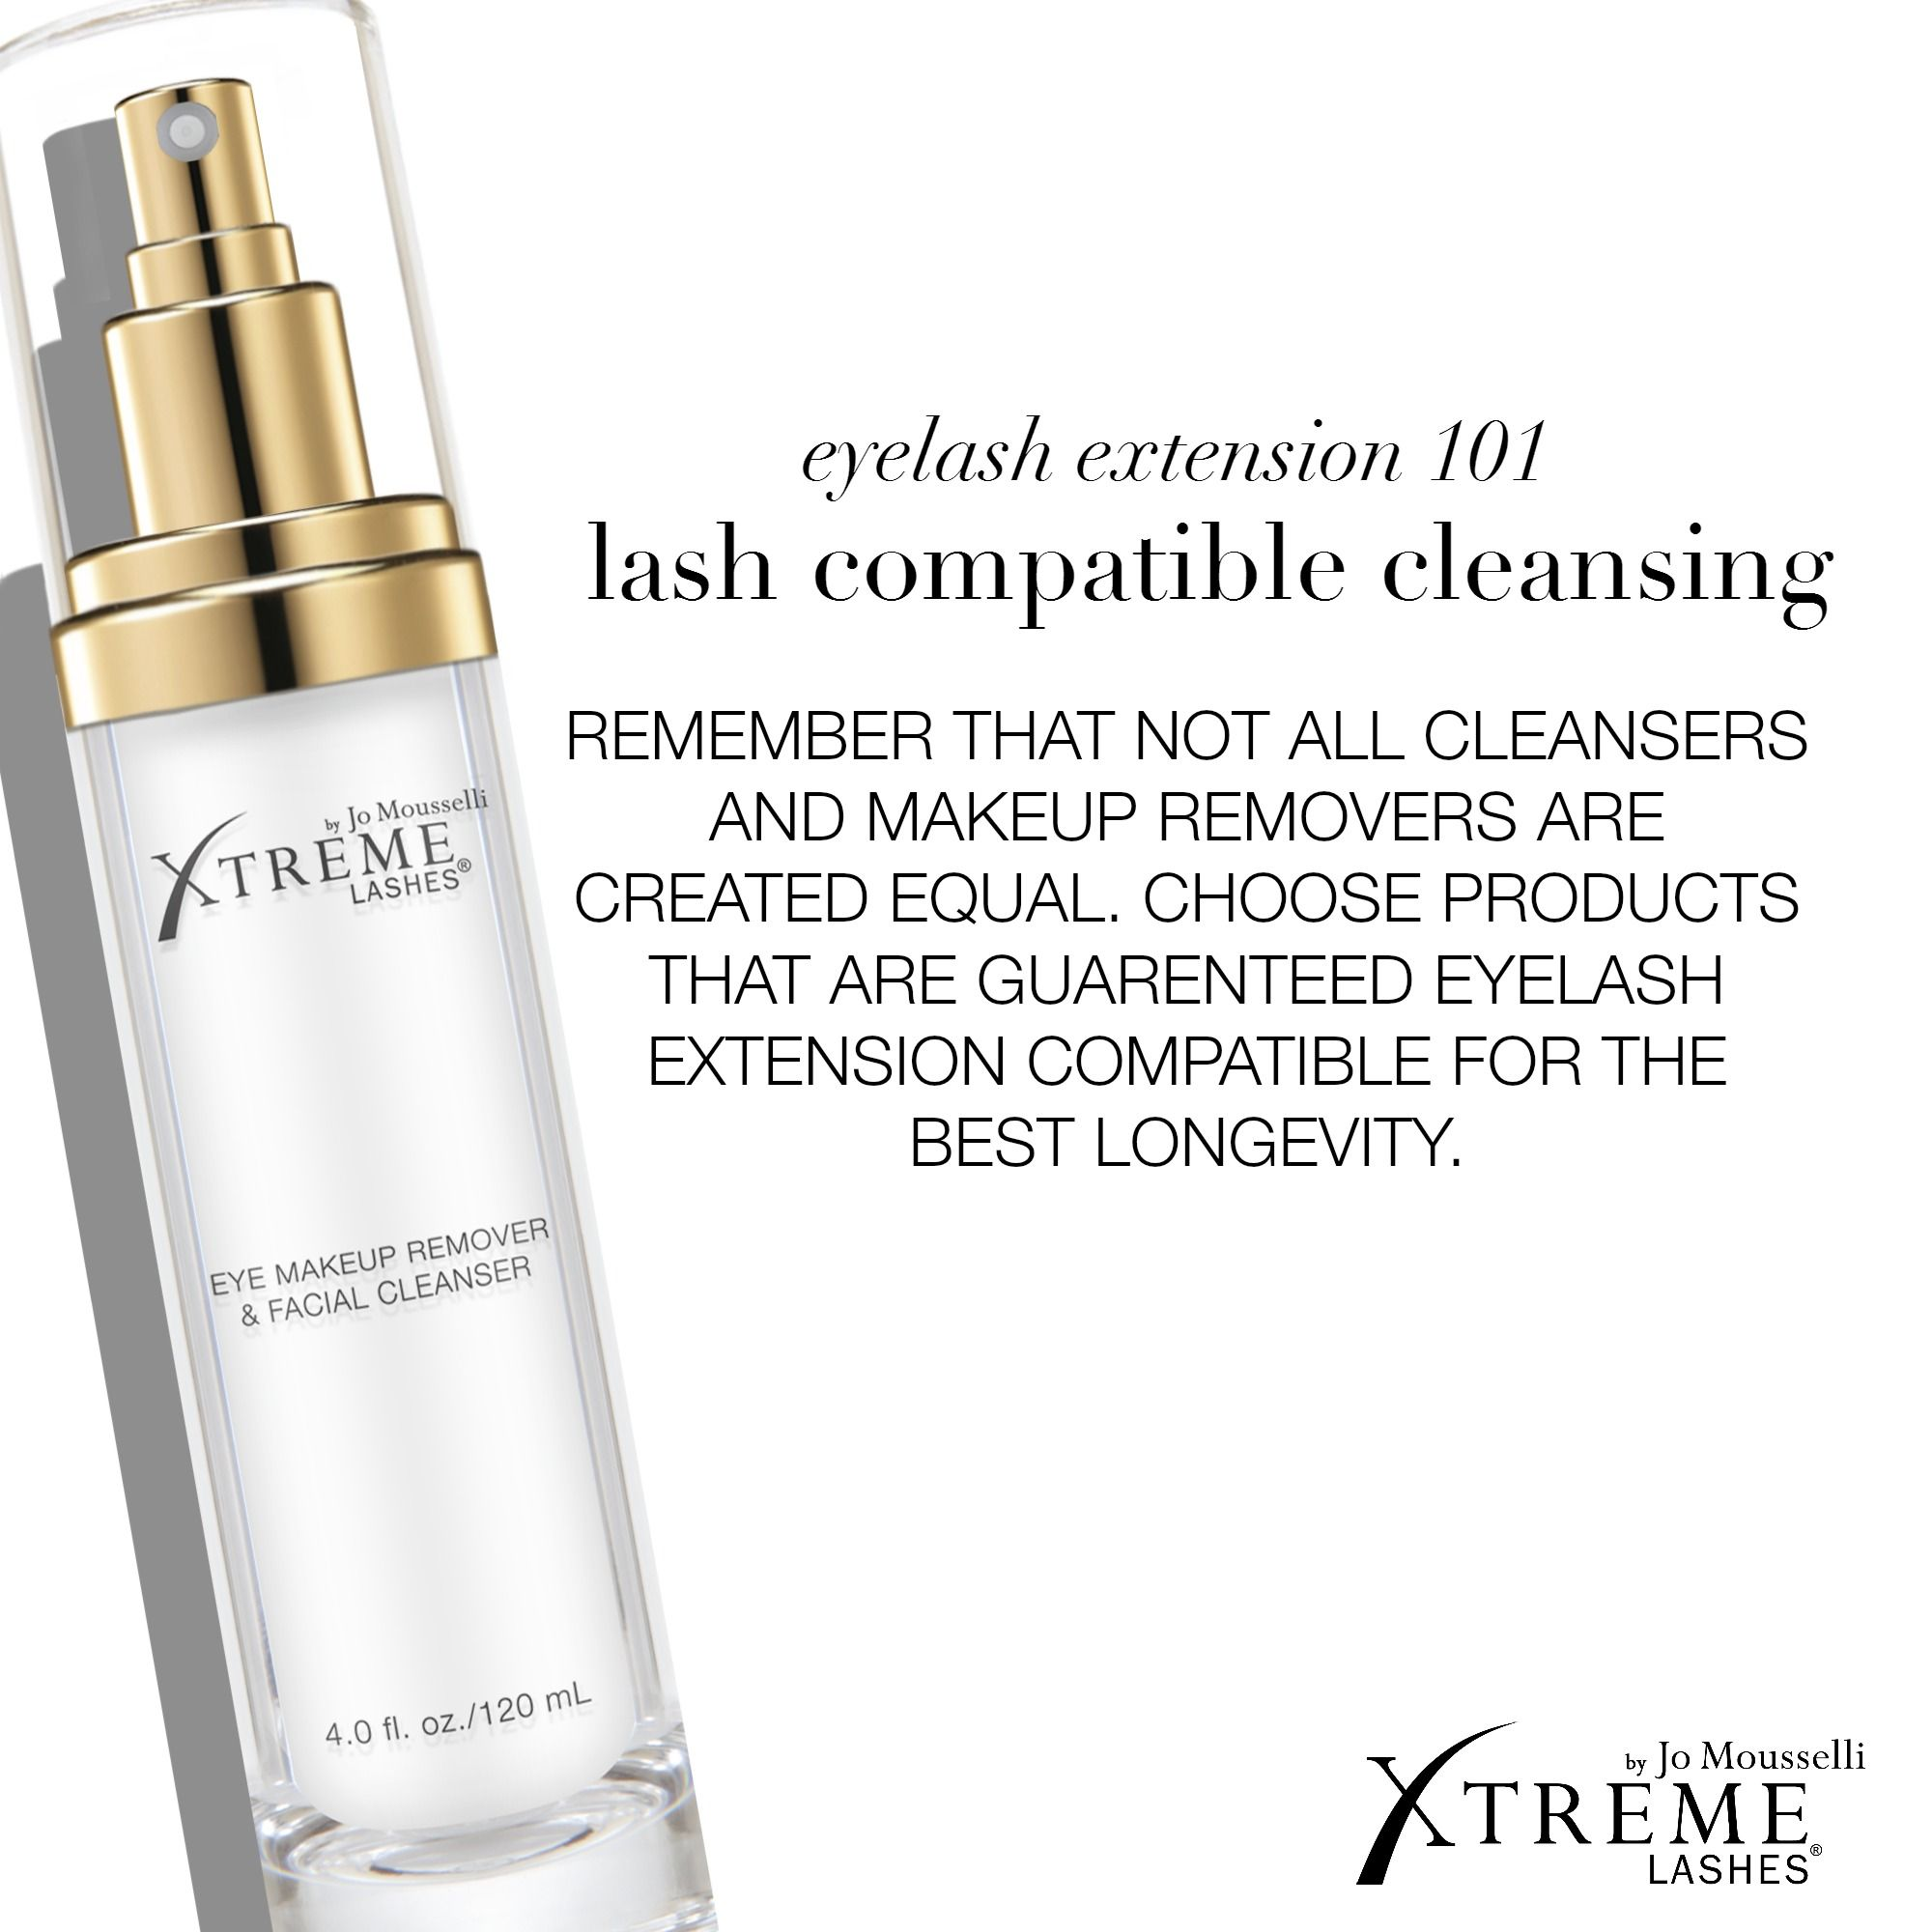 Eyelash Extension 101 By Xtreme Lashes Eyelash Extension 101